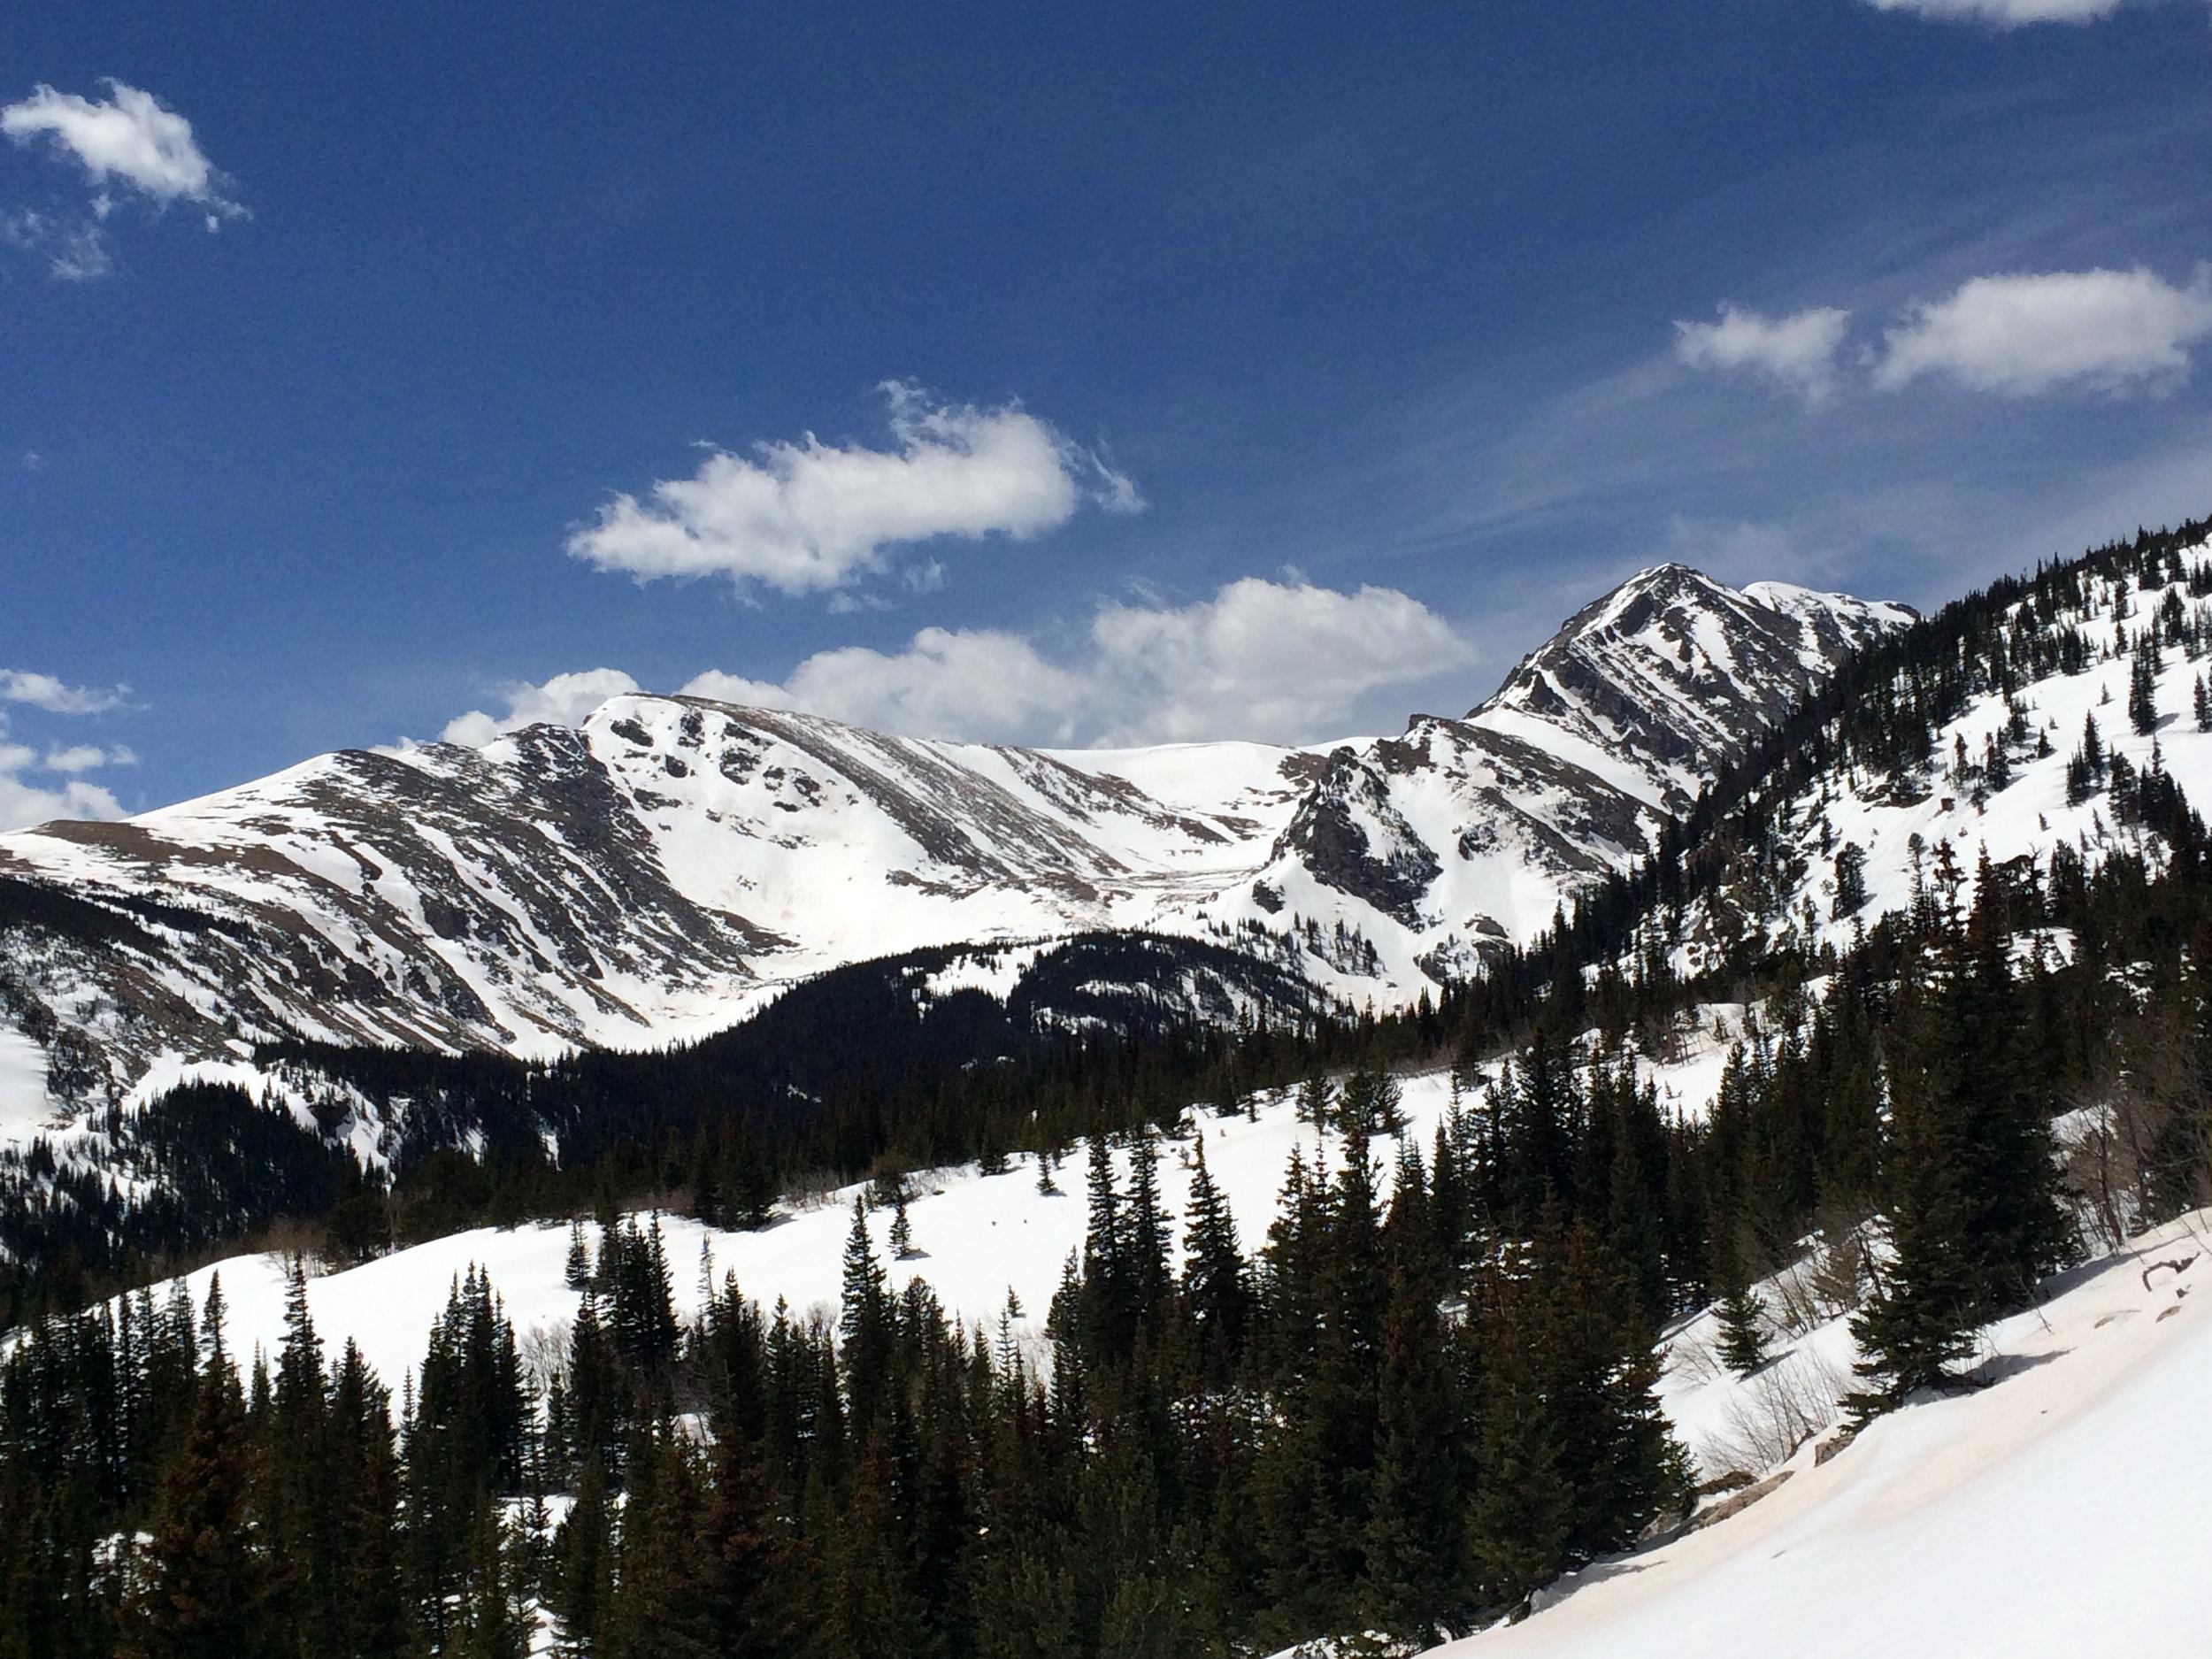 Witter Peak and Mount Eva's East Ridge from the Northeast.